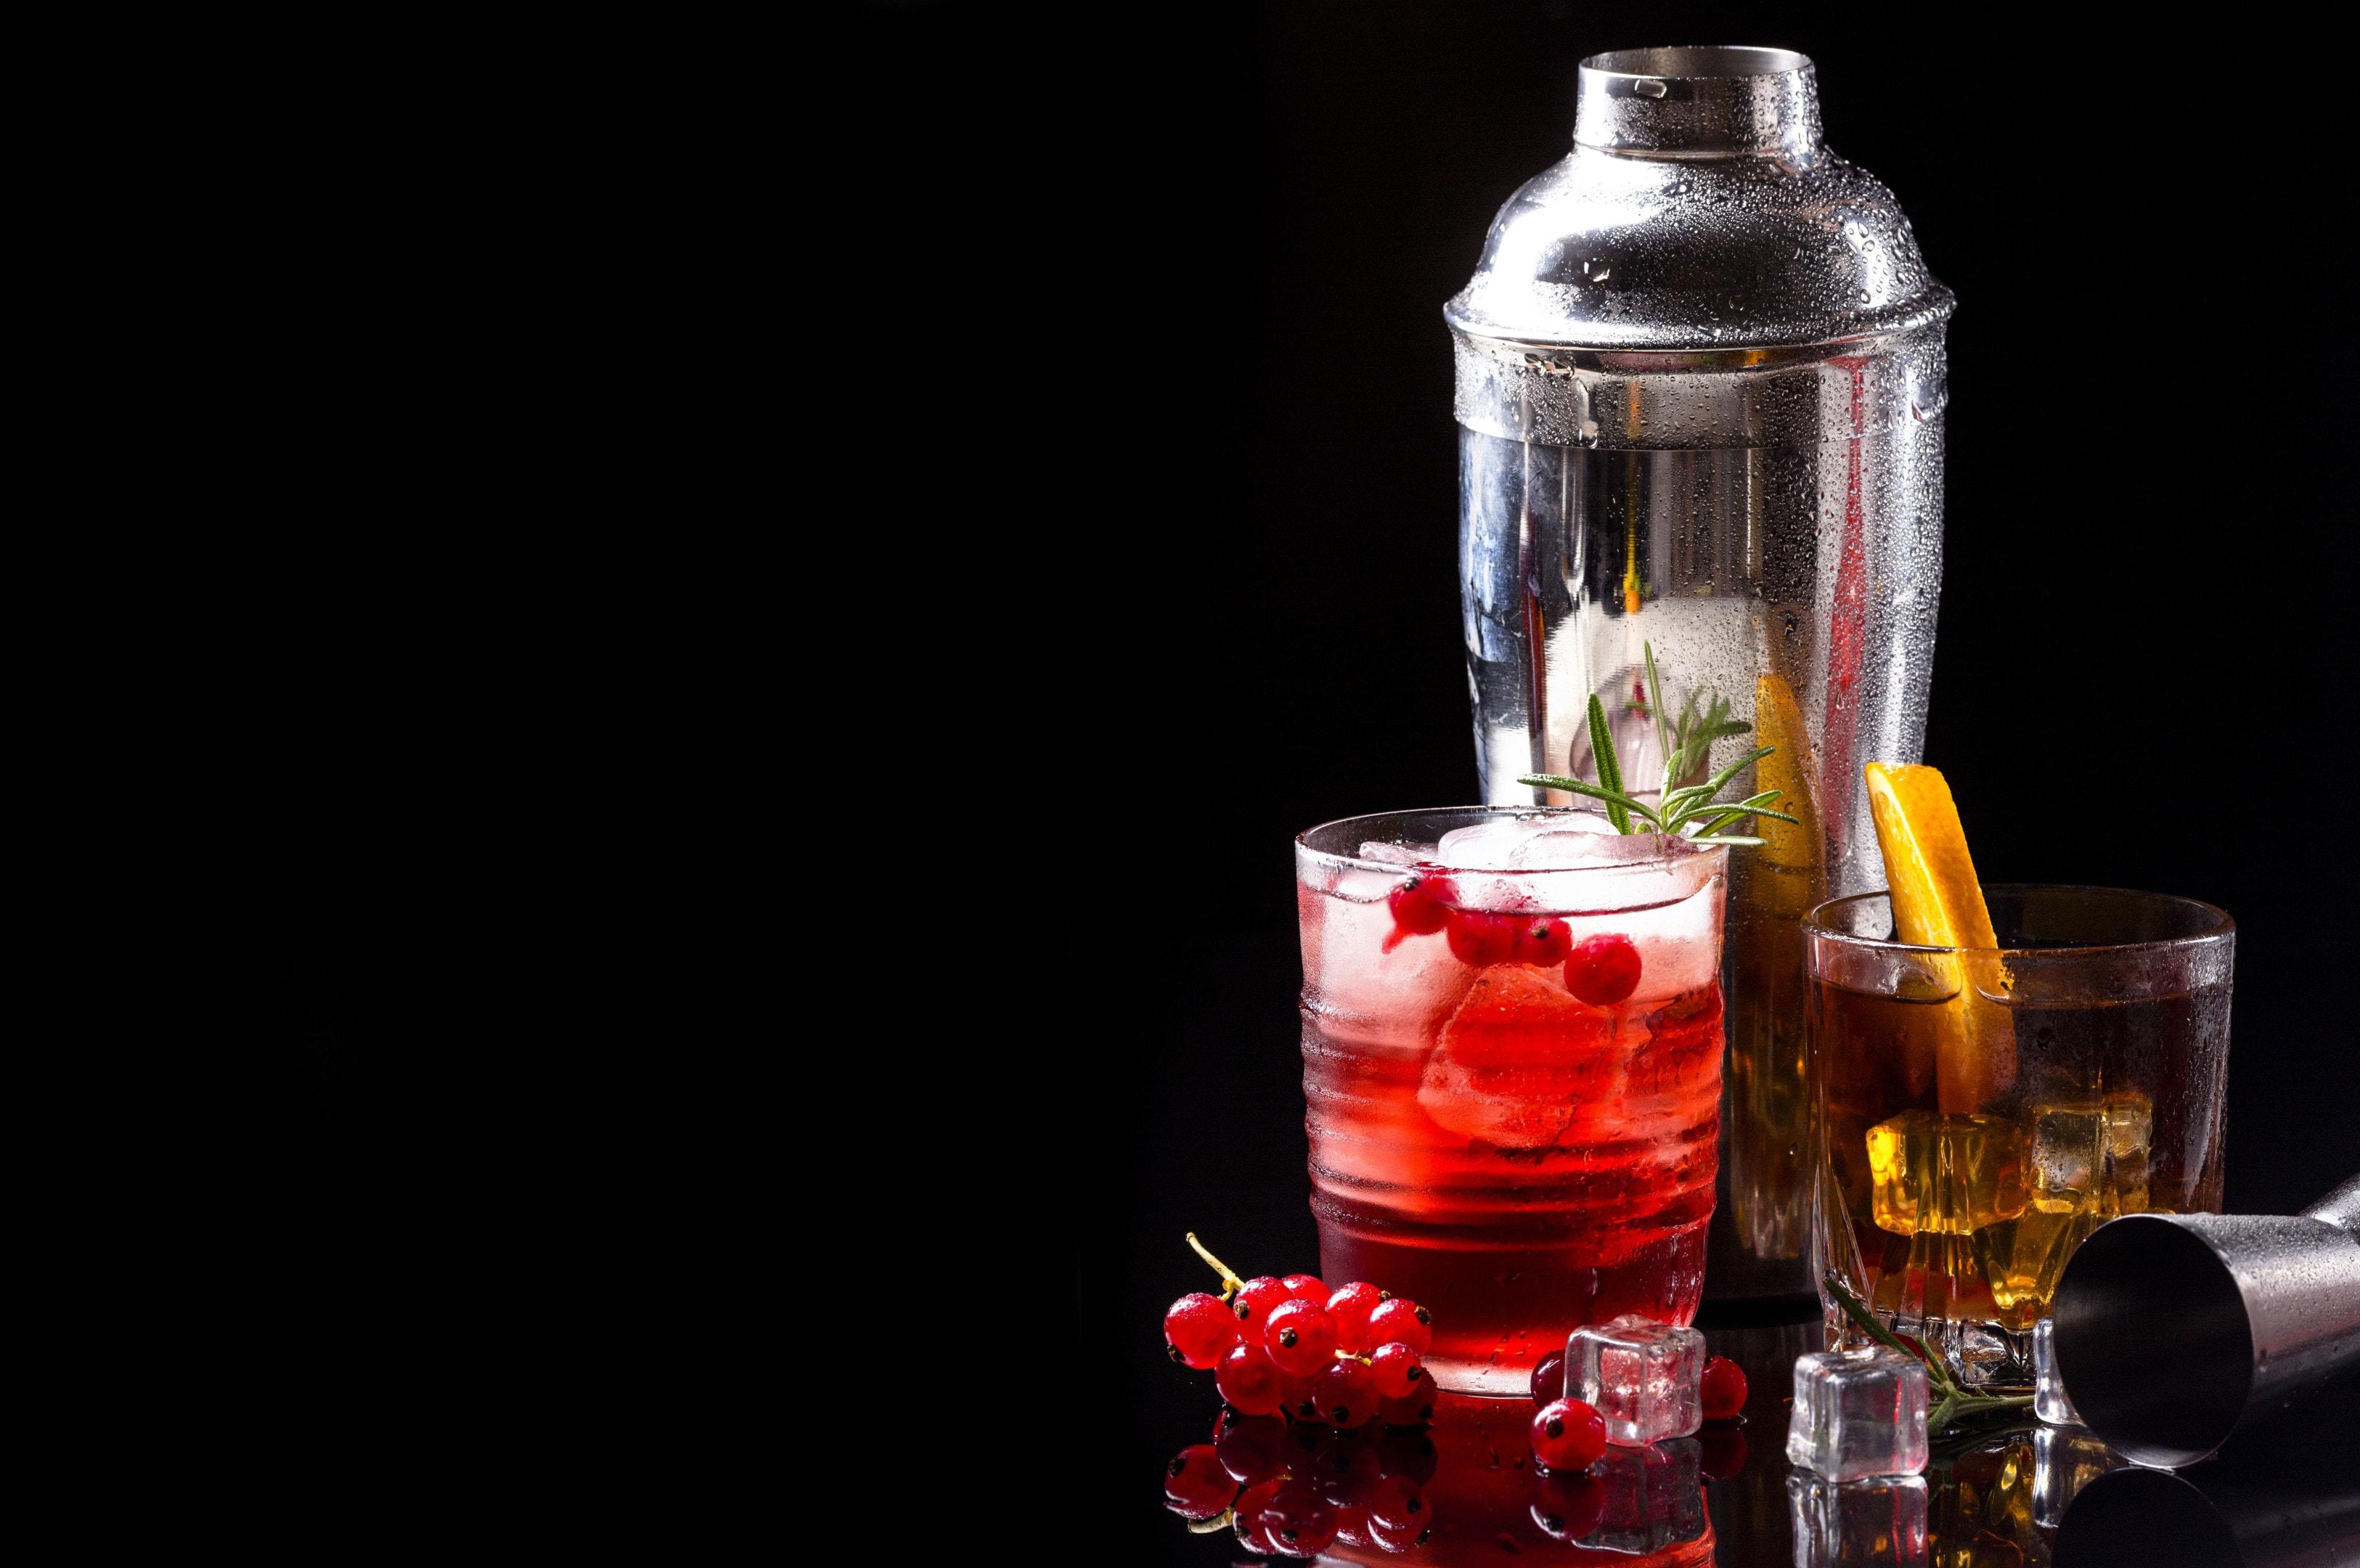 Vodka cranberry and whiskey with orange on black background